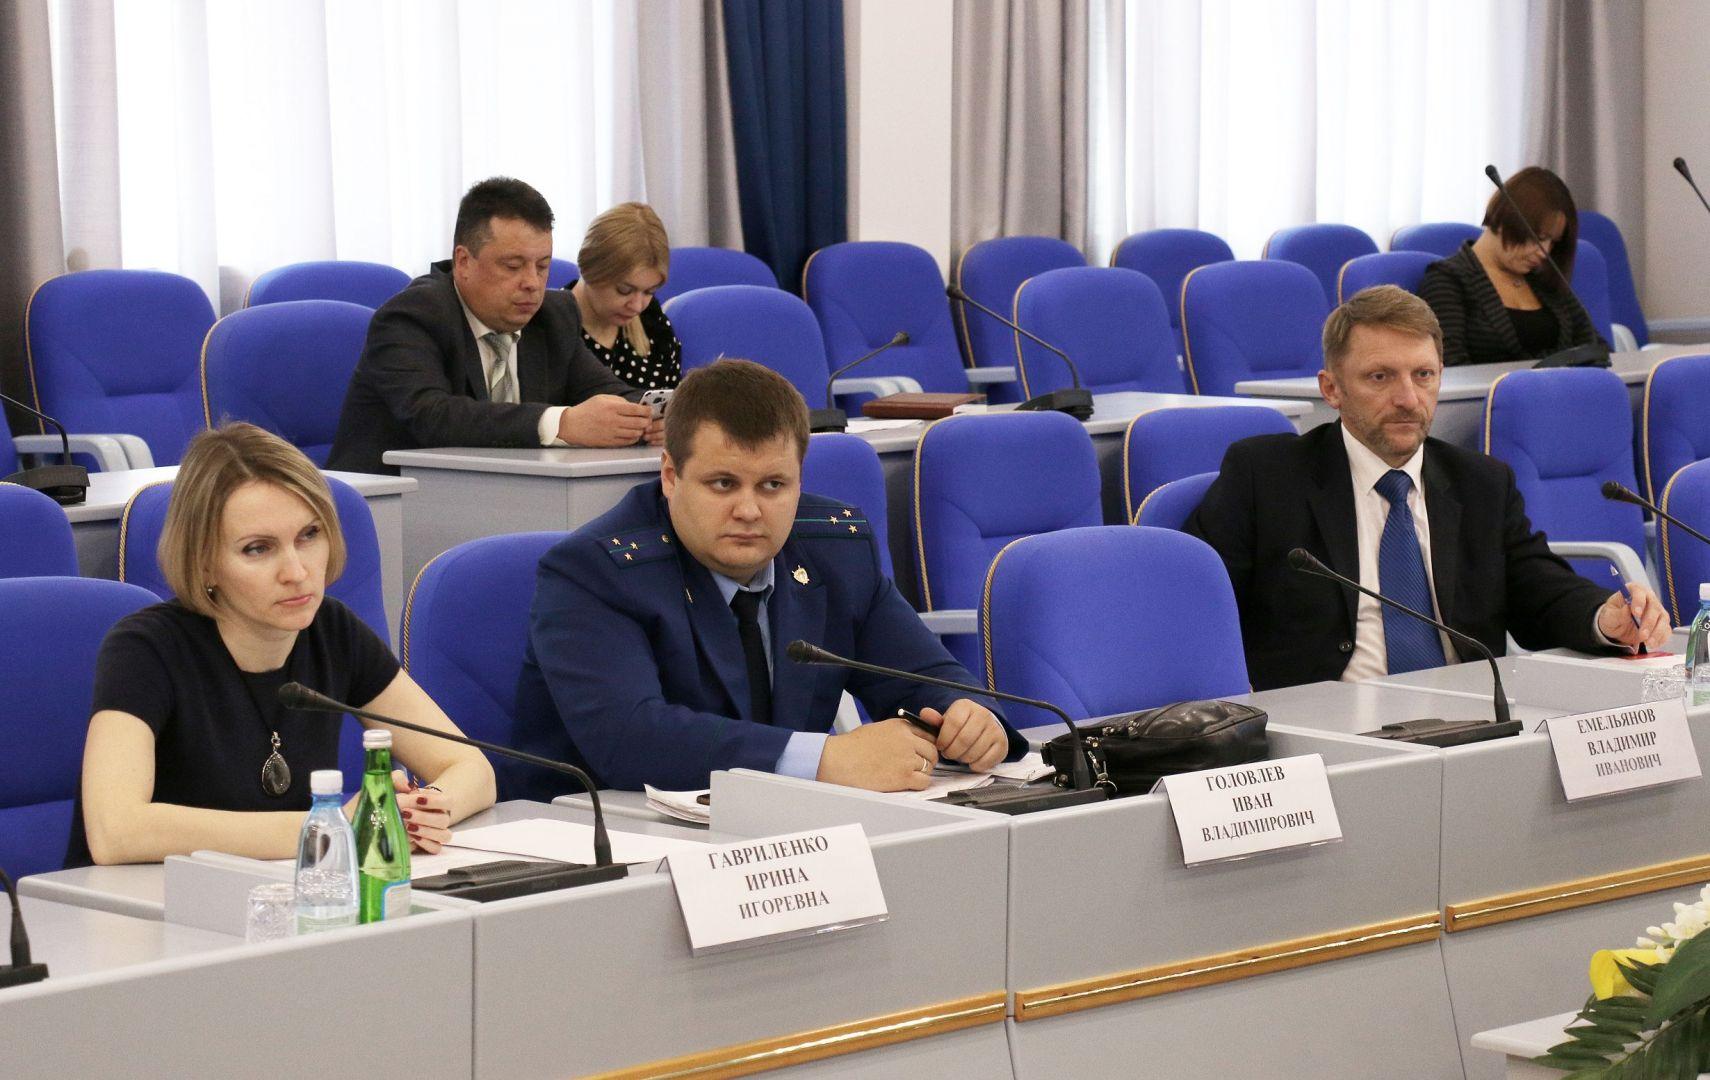 В Ставрополе парламентарии обсудили развитие водохозяйственного комплекса края